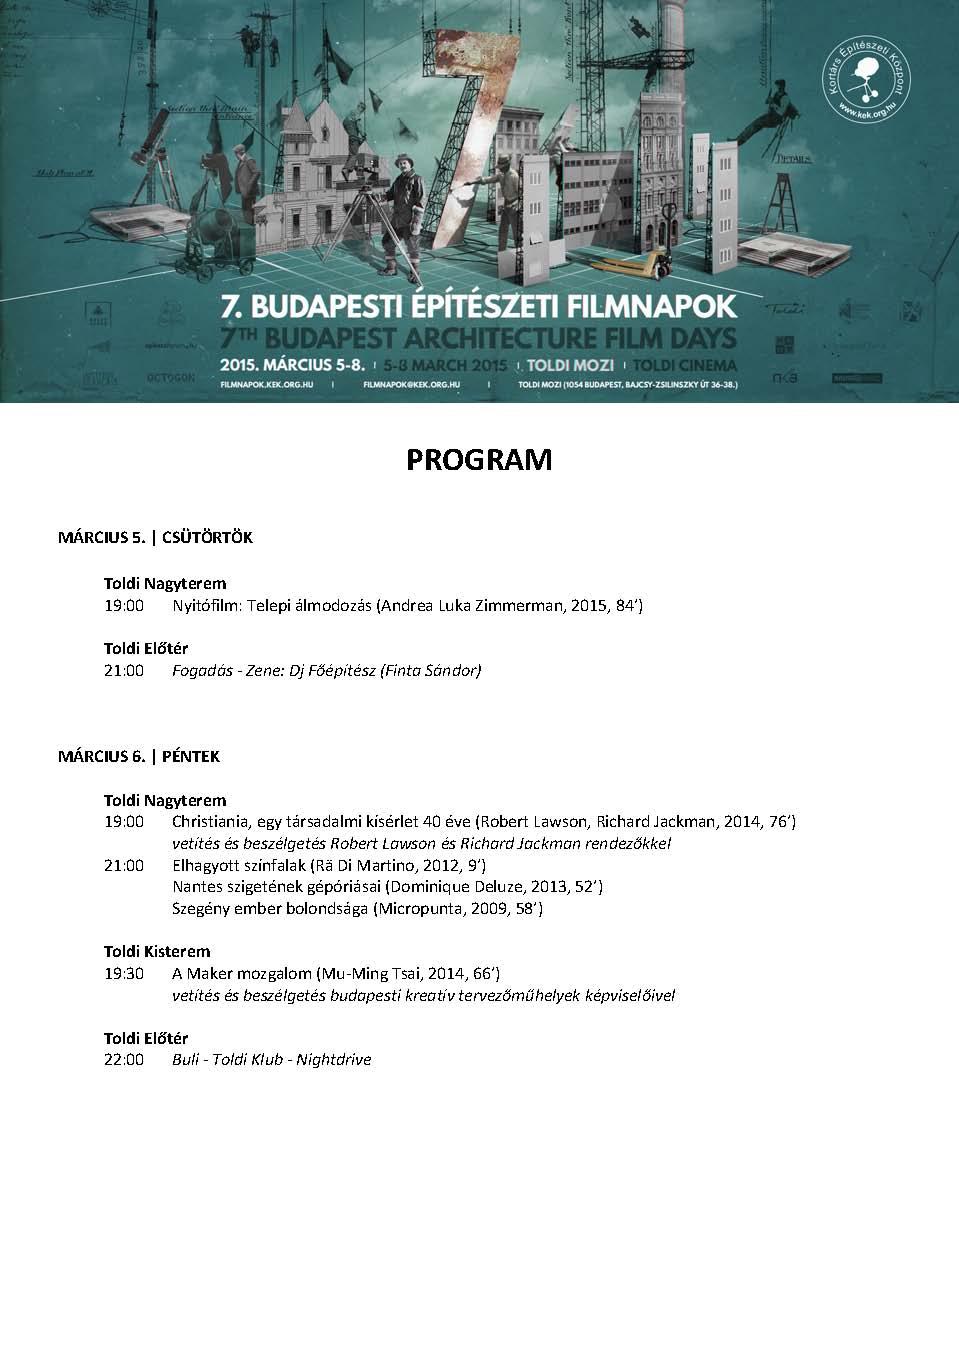 7_Budapesti_Epiteszeti_Filmnapok_program_Page_2